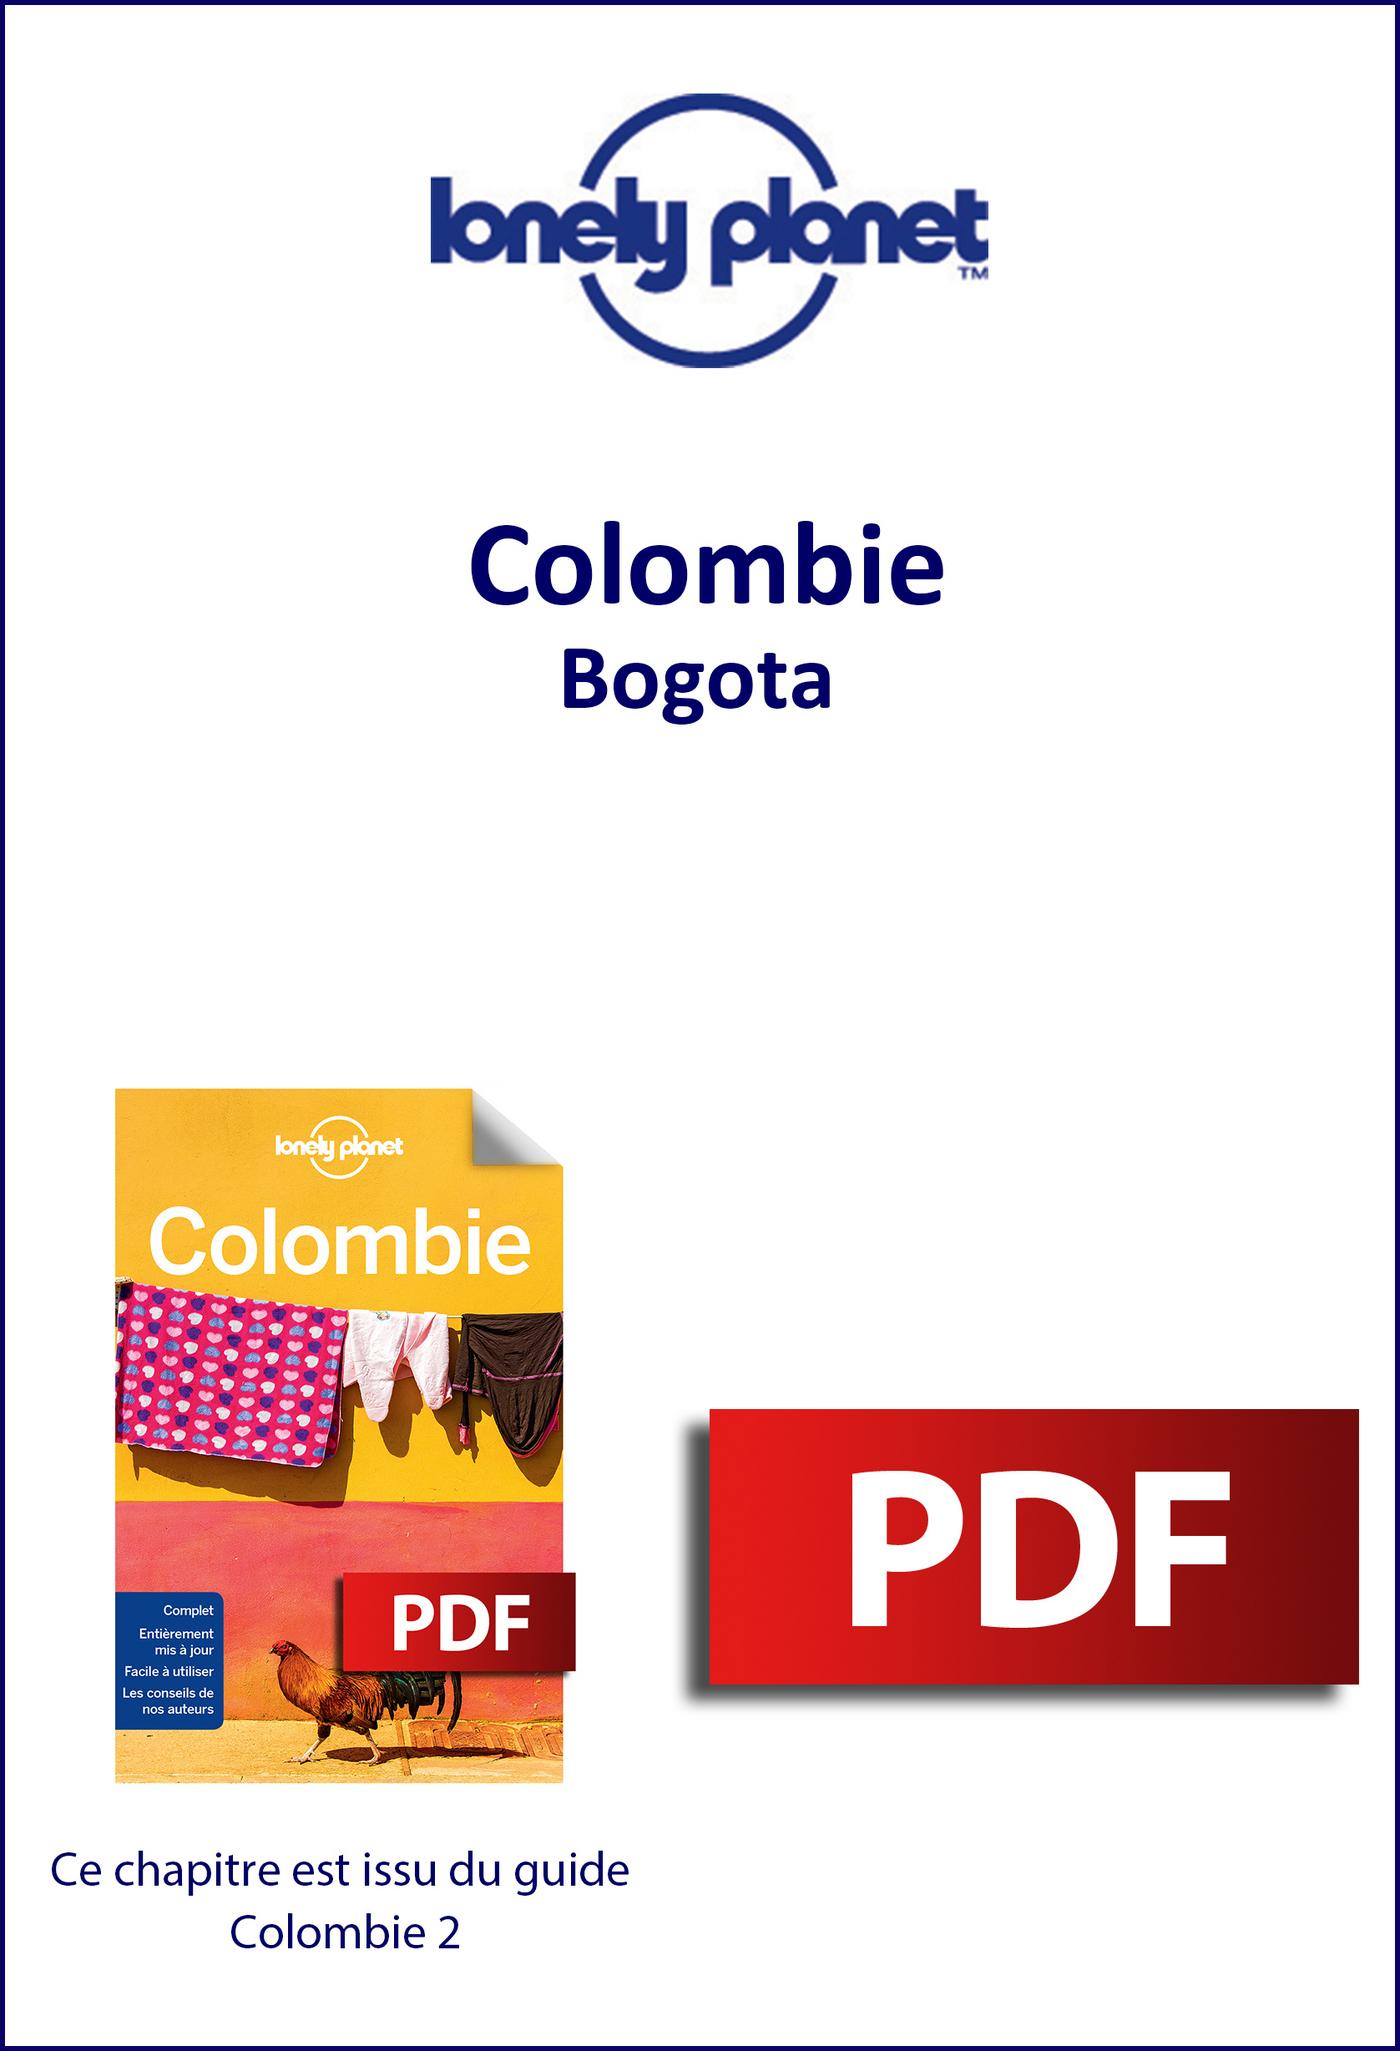 Colombie - Bogota